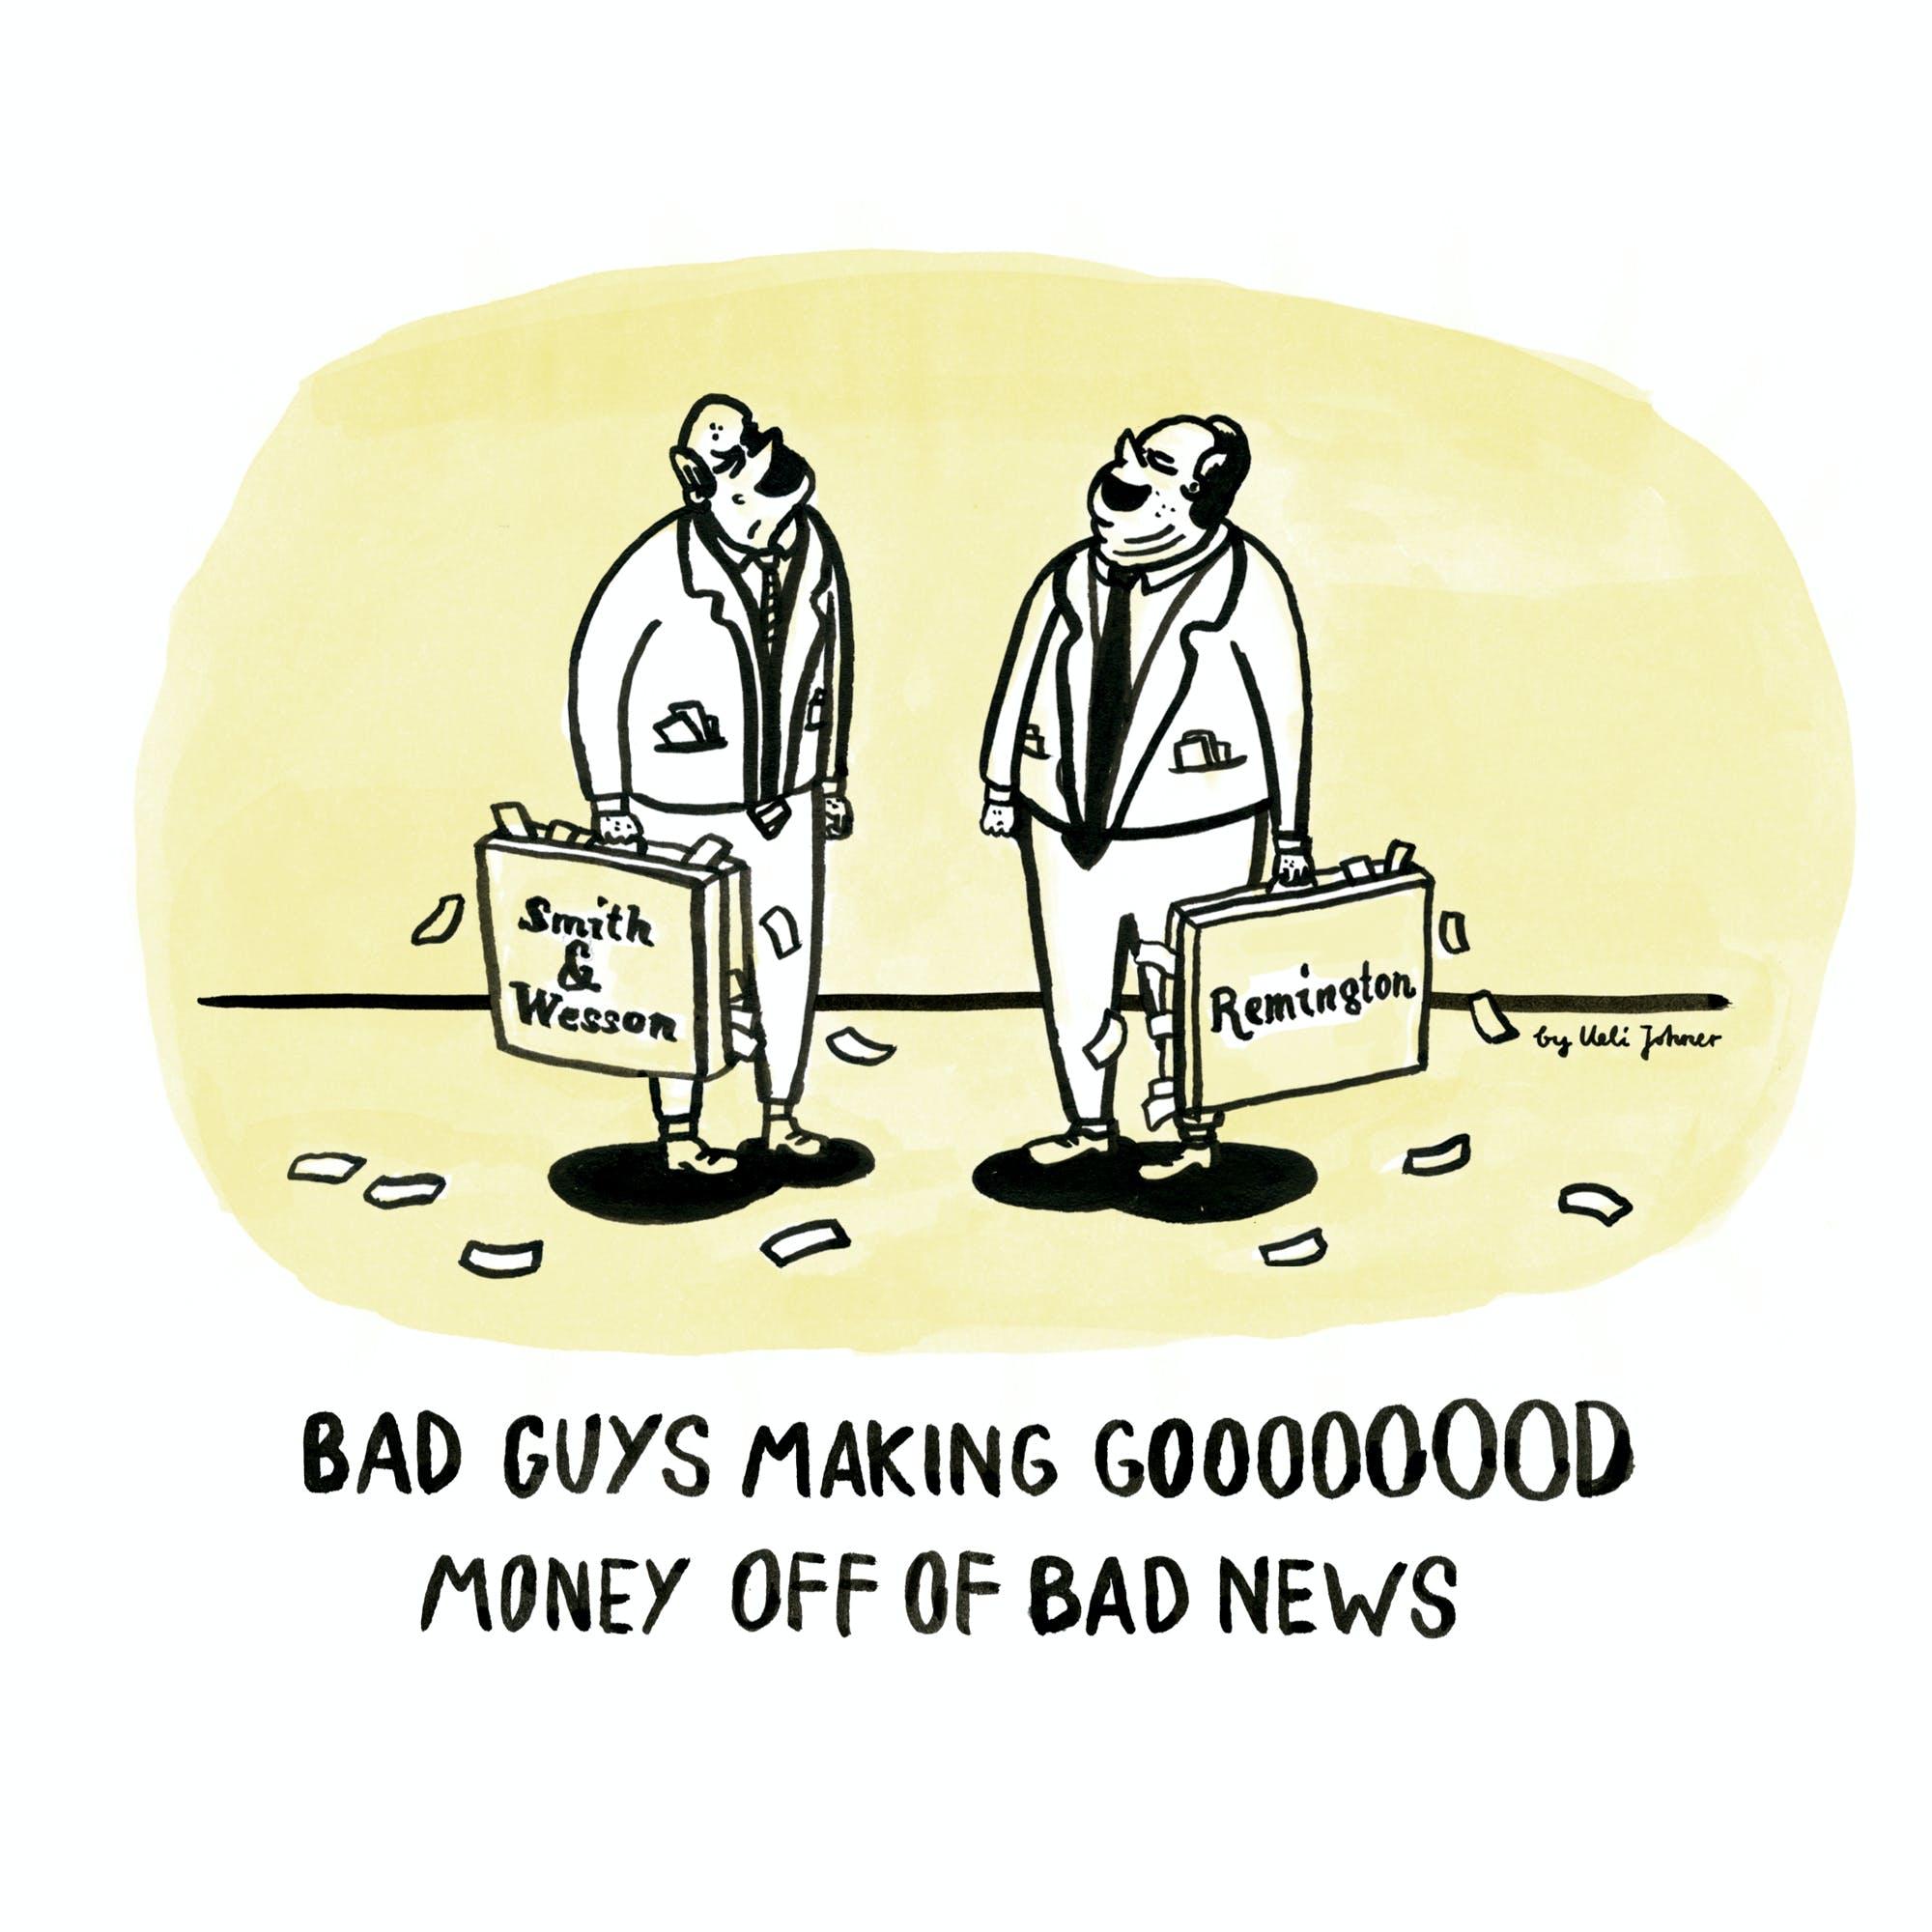 https   thenib.com good-guys-and-bad-guns 5bd0ab89b1d2